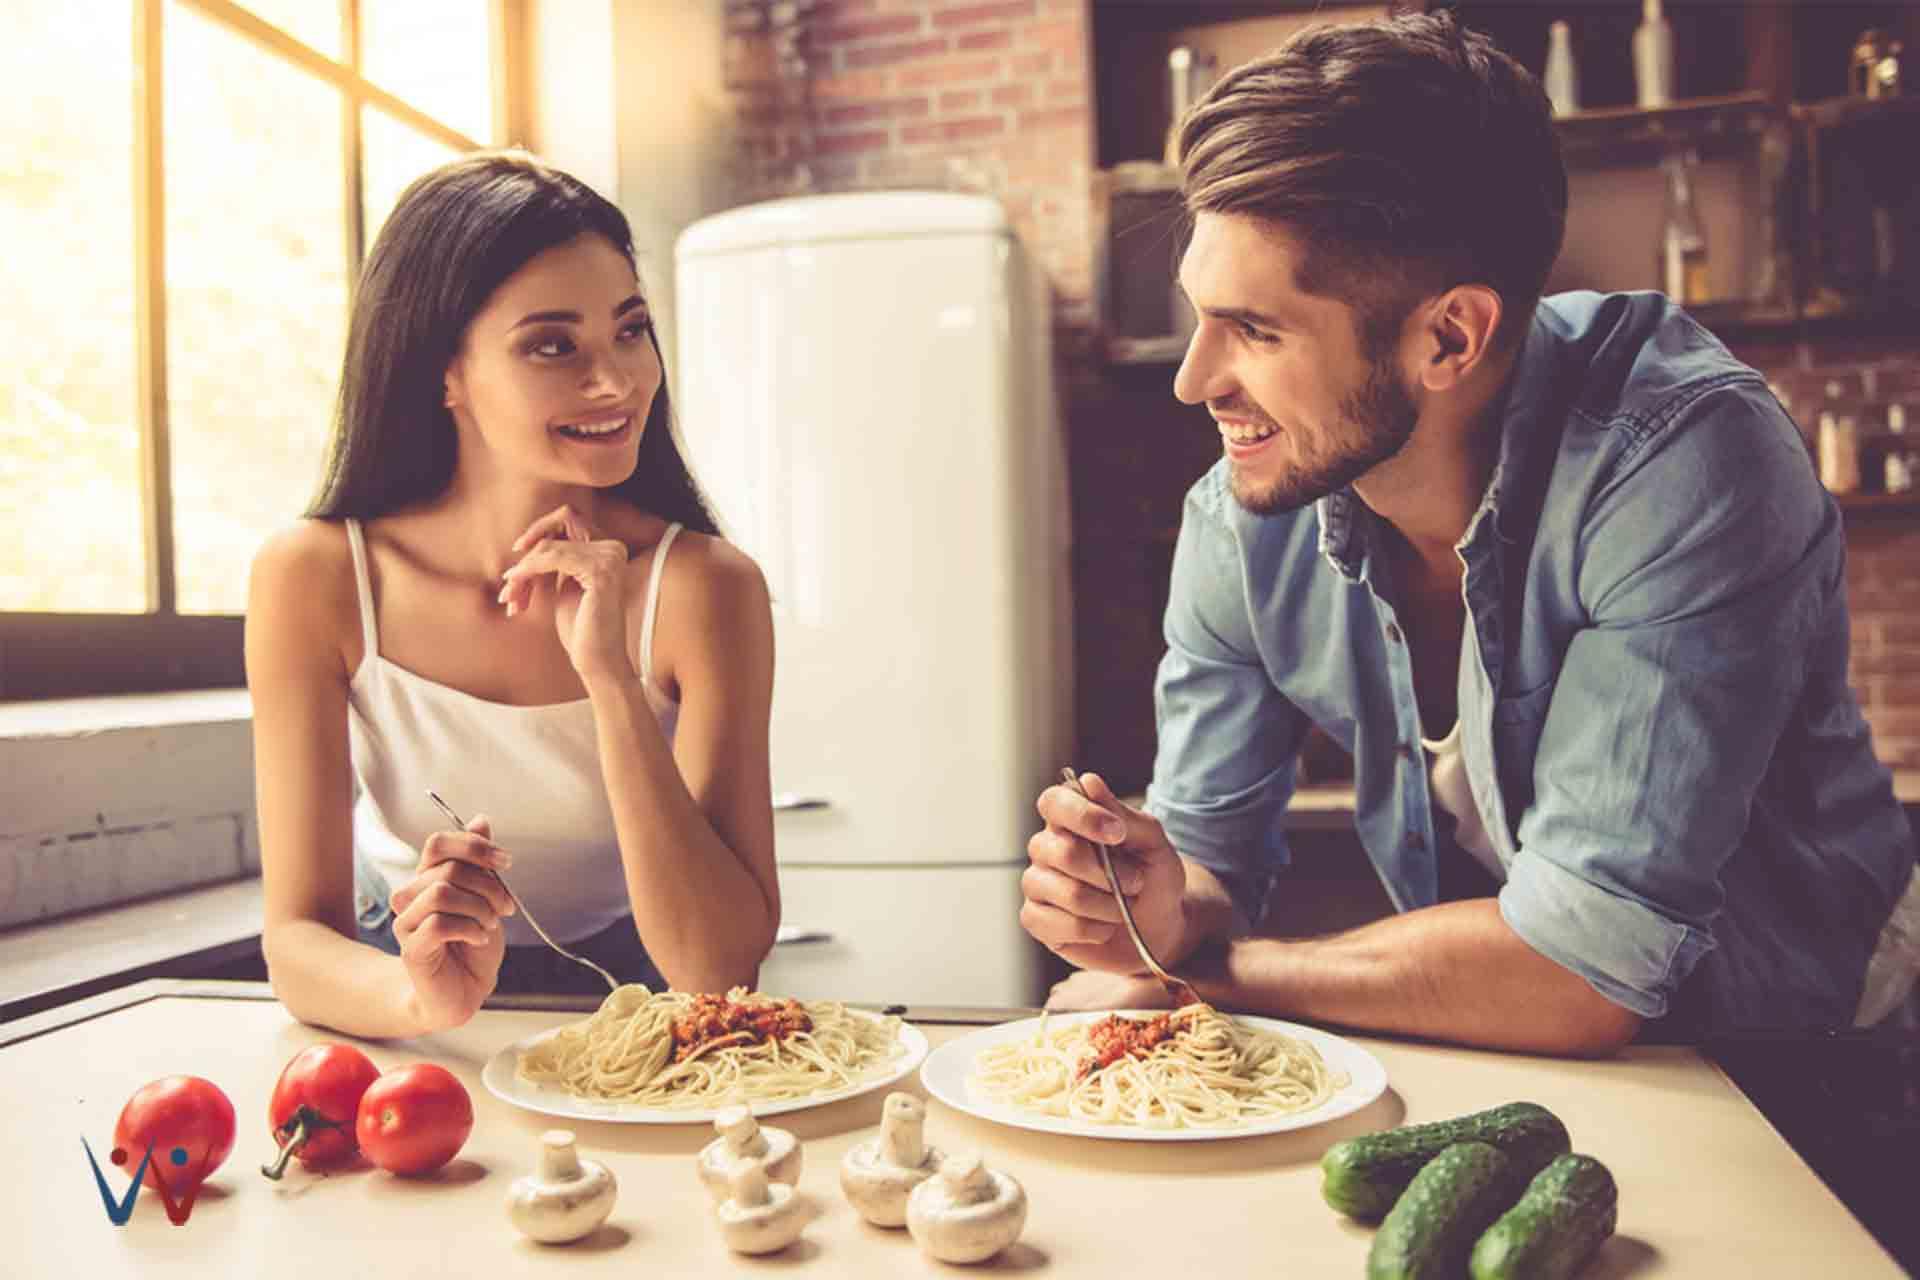 makan malam romantis - Selain Coklat, Ini Hadiah Valentine Hemat Budget yang Cocok Buat Pasangan Kamu!